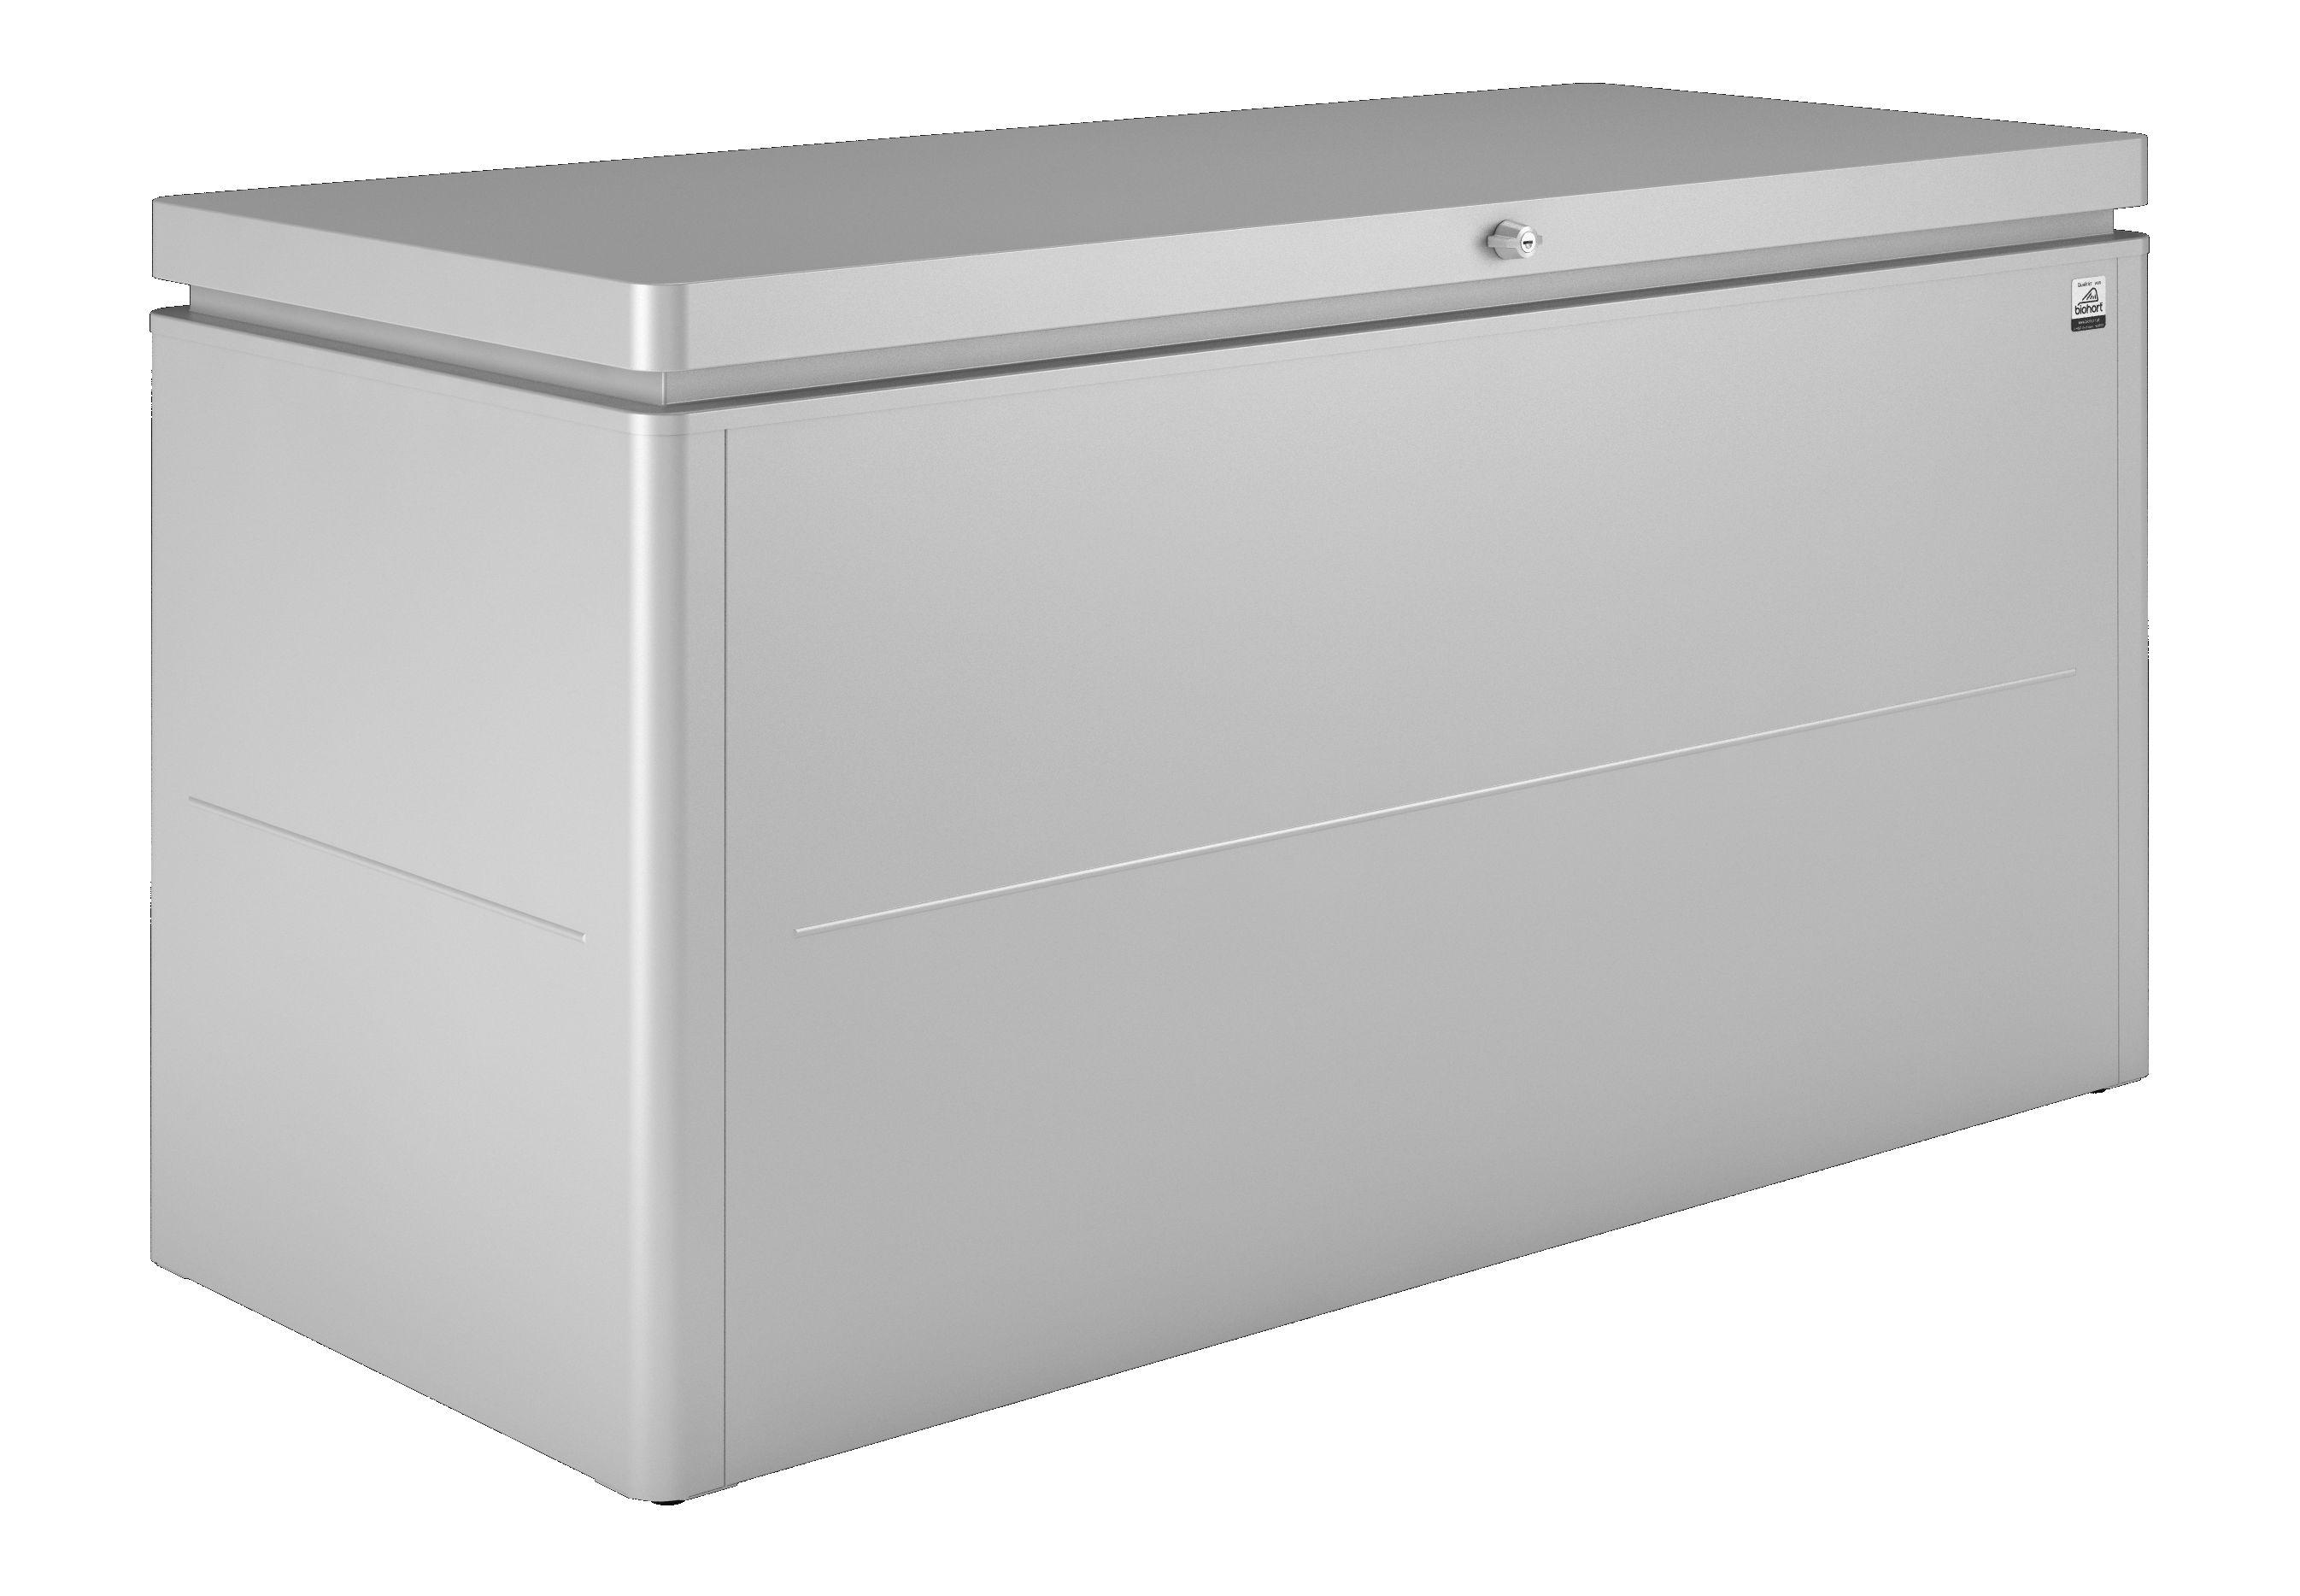 Biohort Úložný box LoungeBox® 160, stříbrná metalíza